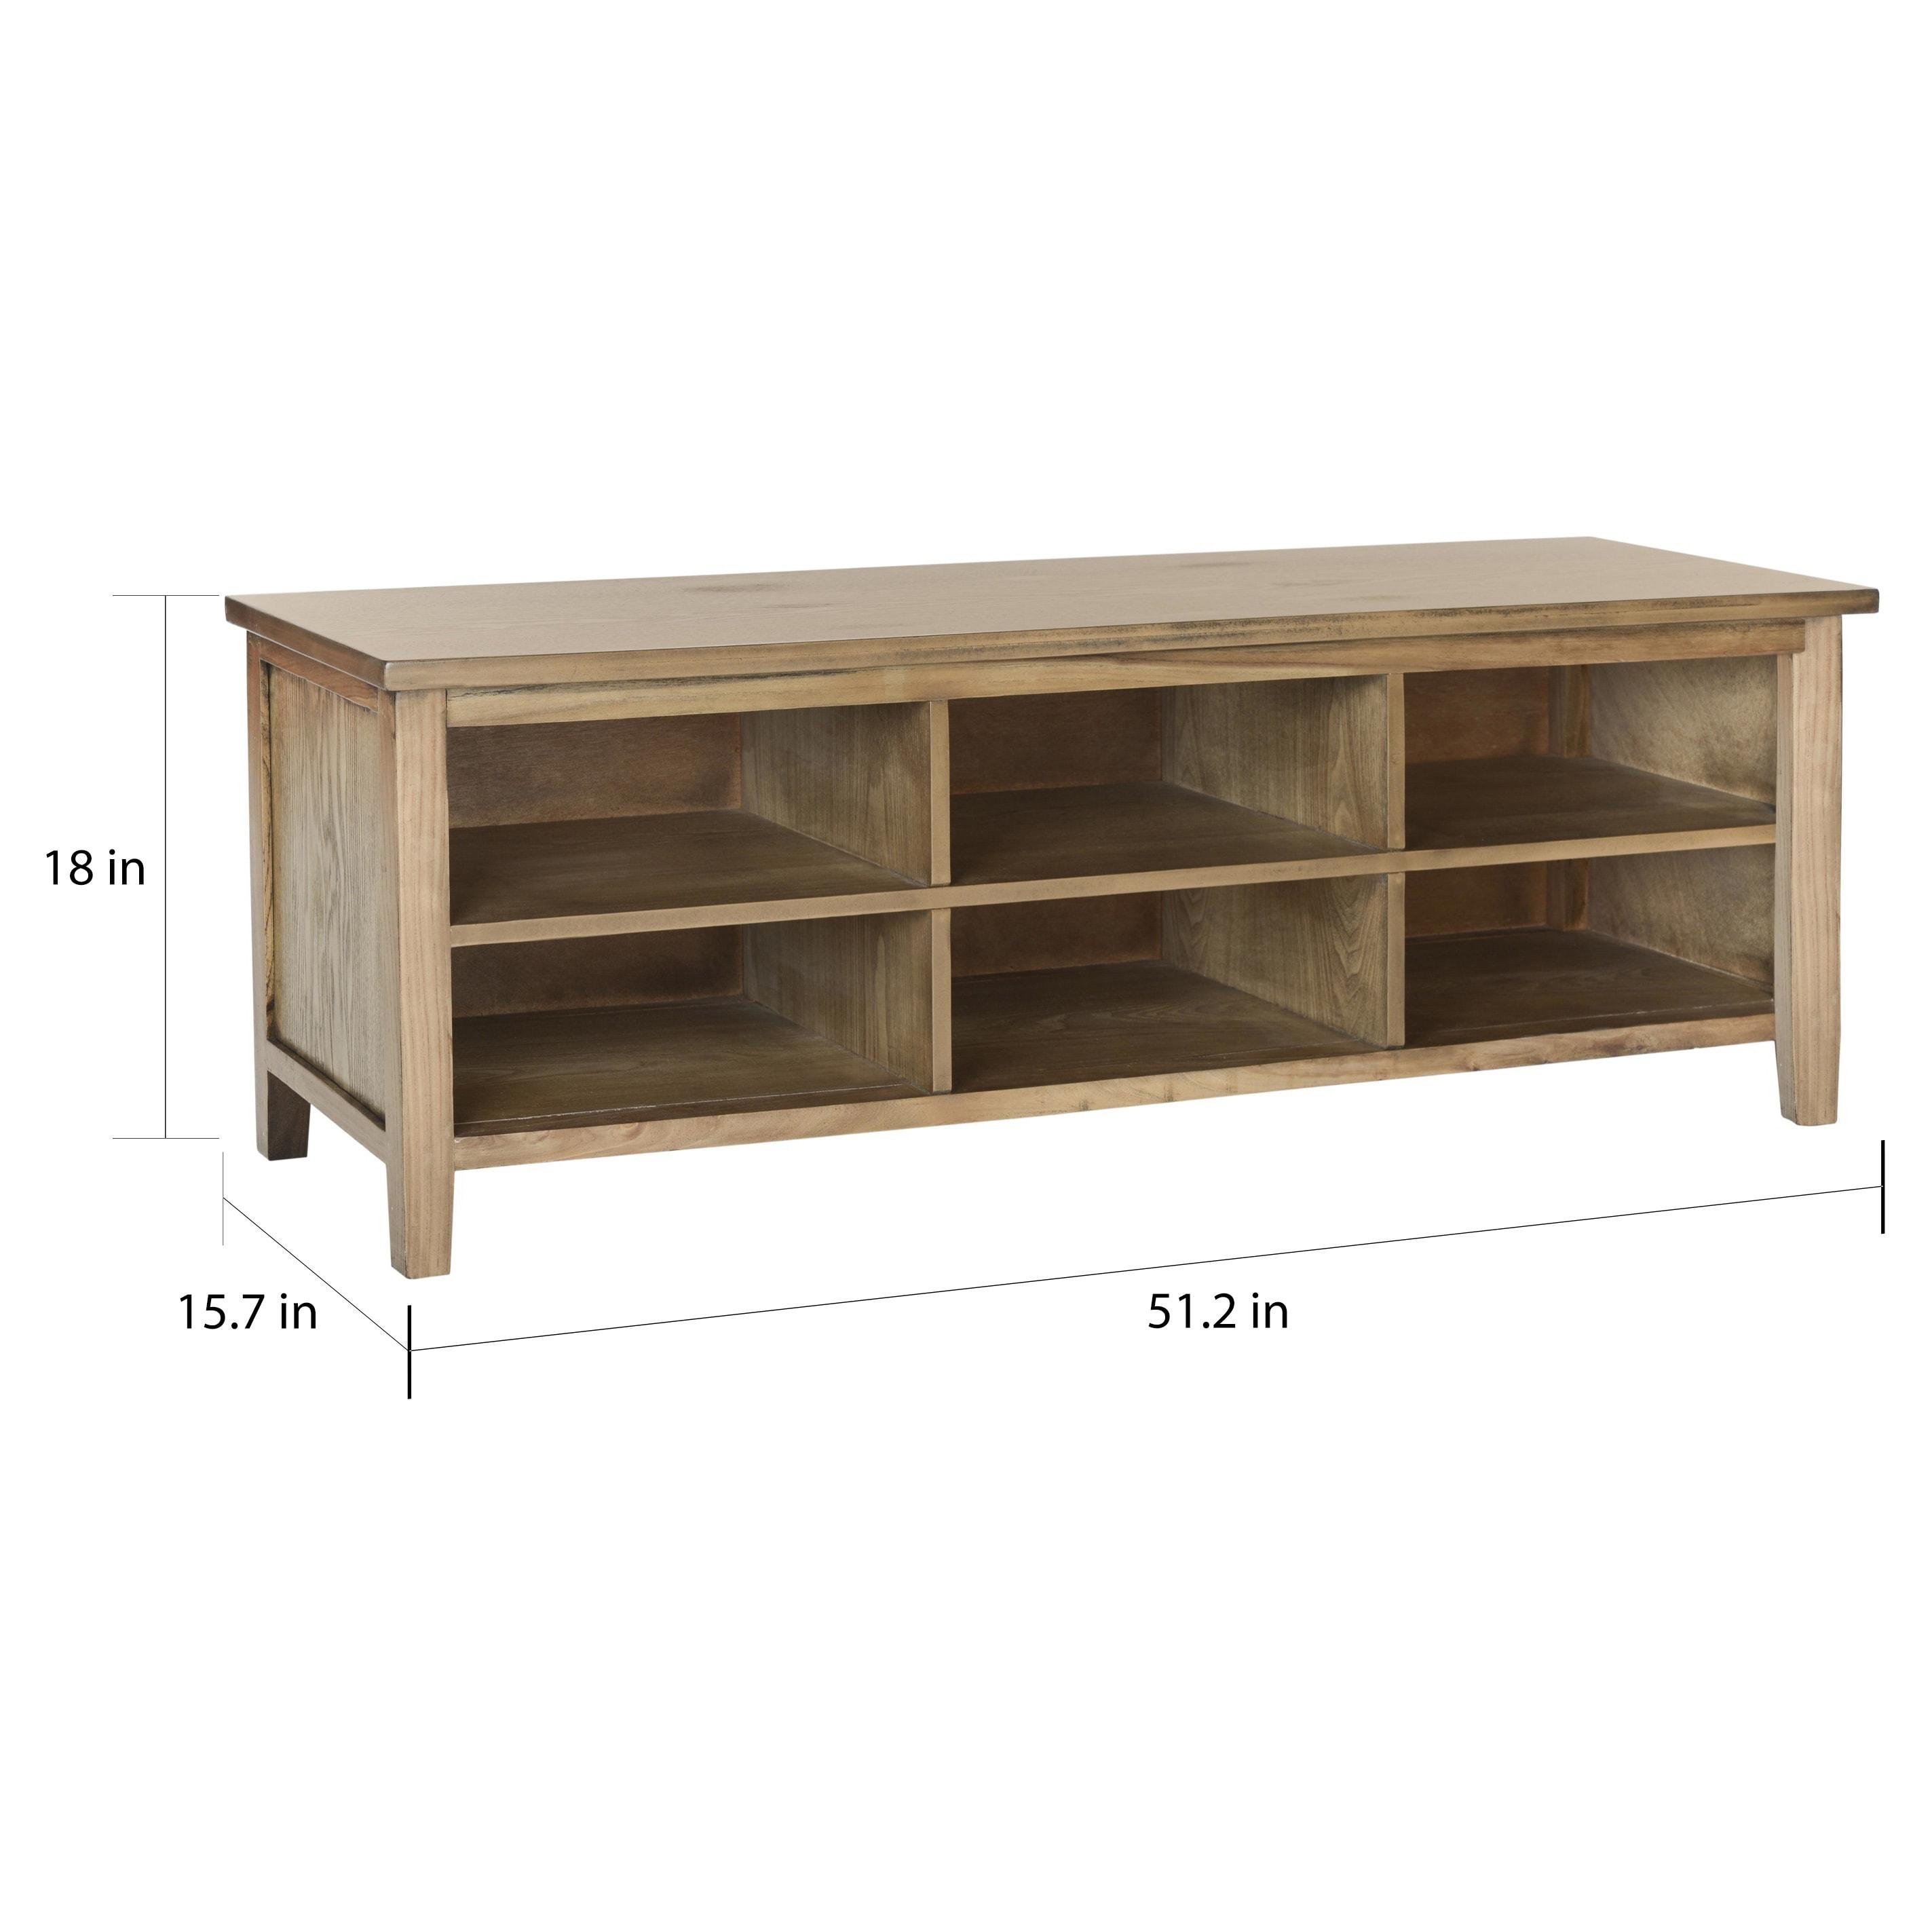 Safavieh Sadie Oak Finish Low Bookshelf 51 2 X 15 7 X 19